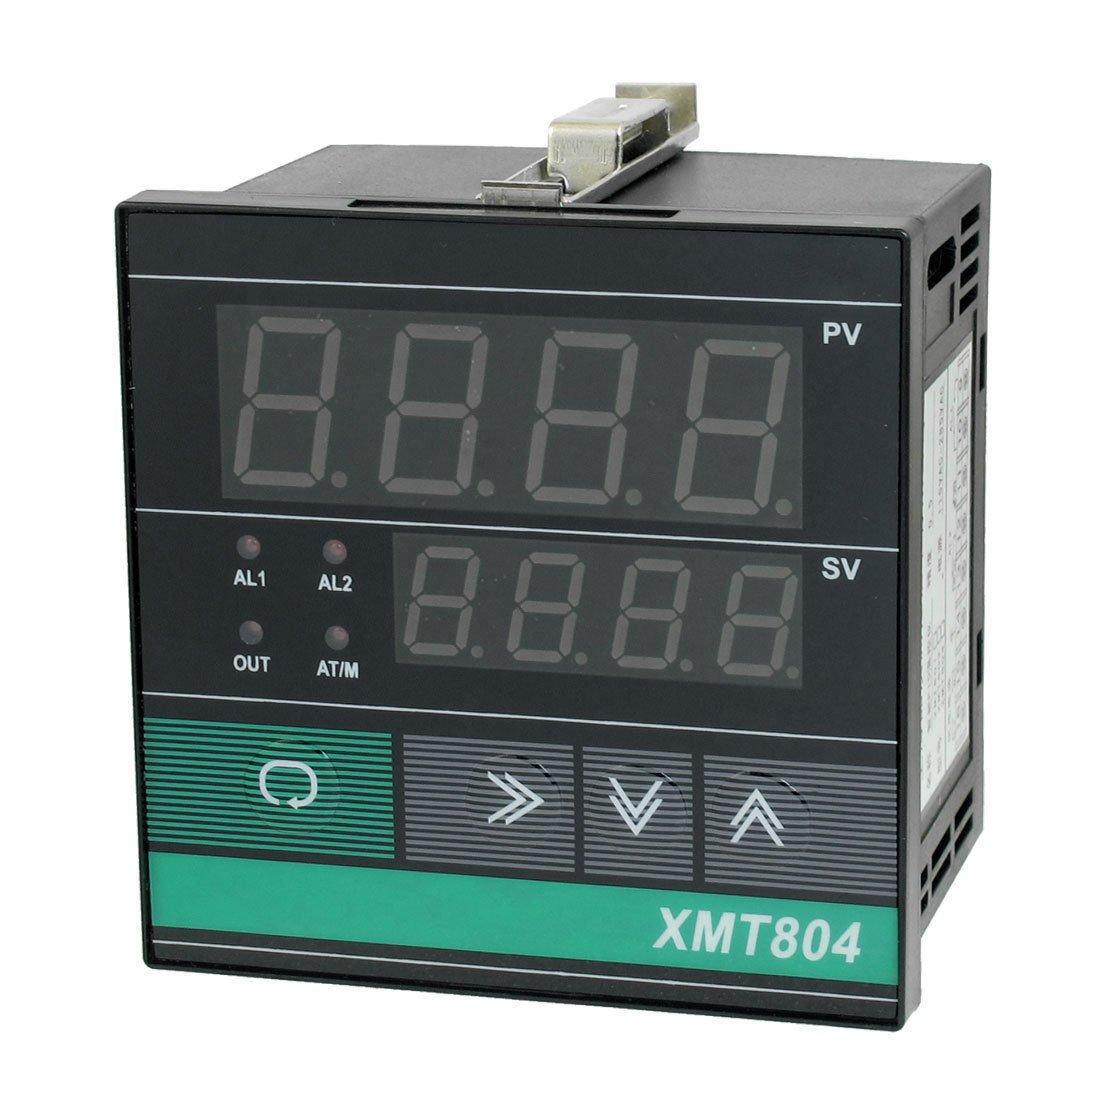 SSR Output PV SV Display PID Digital Temperature Controller Meter XMT-804